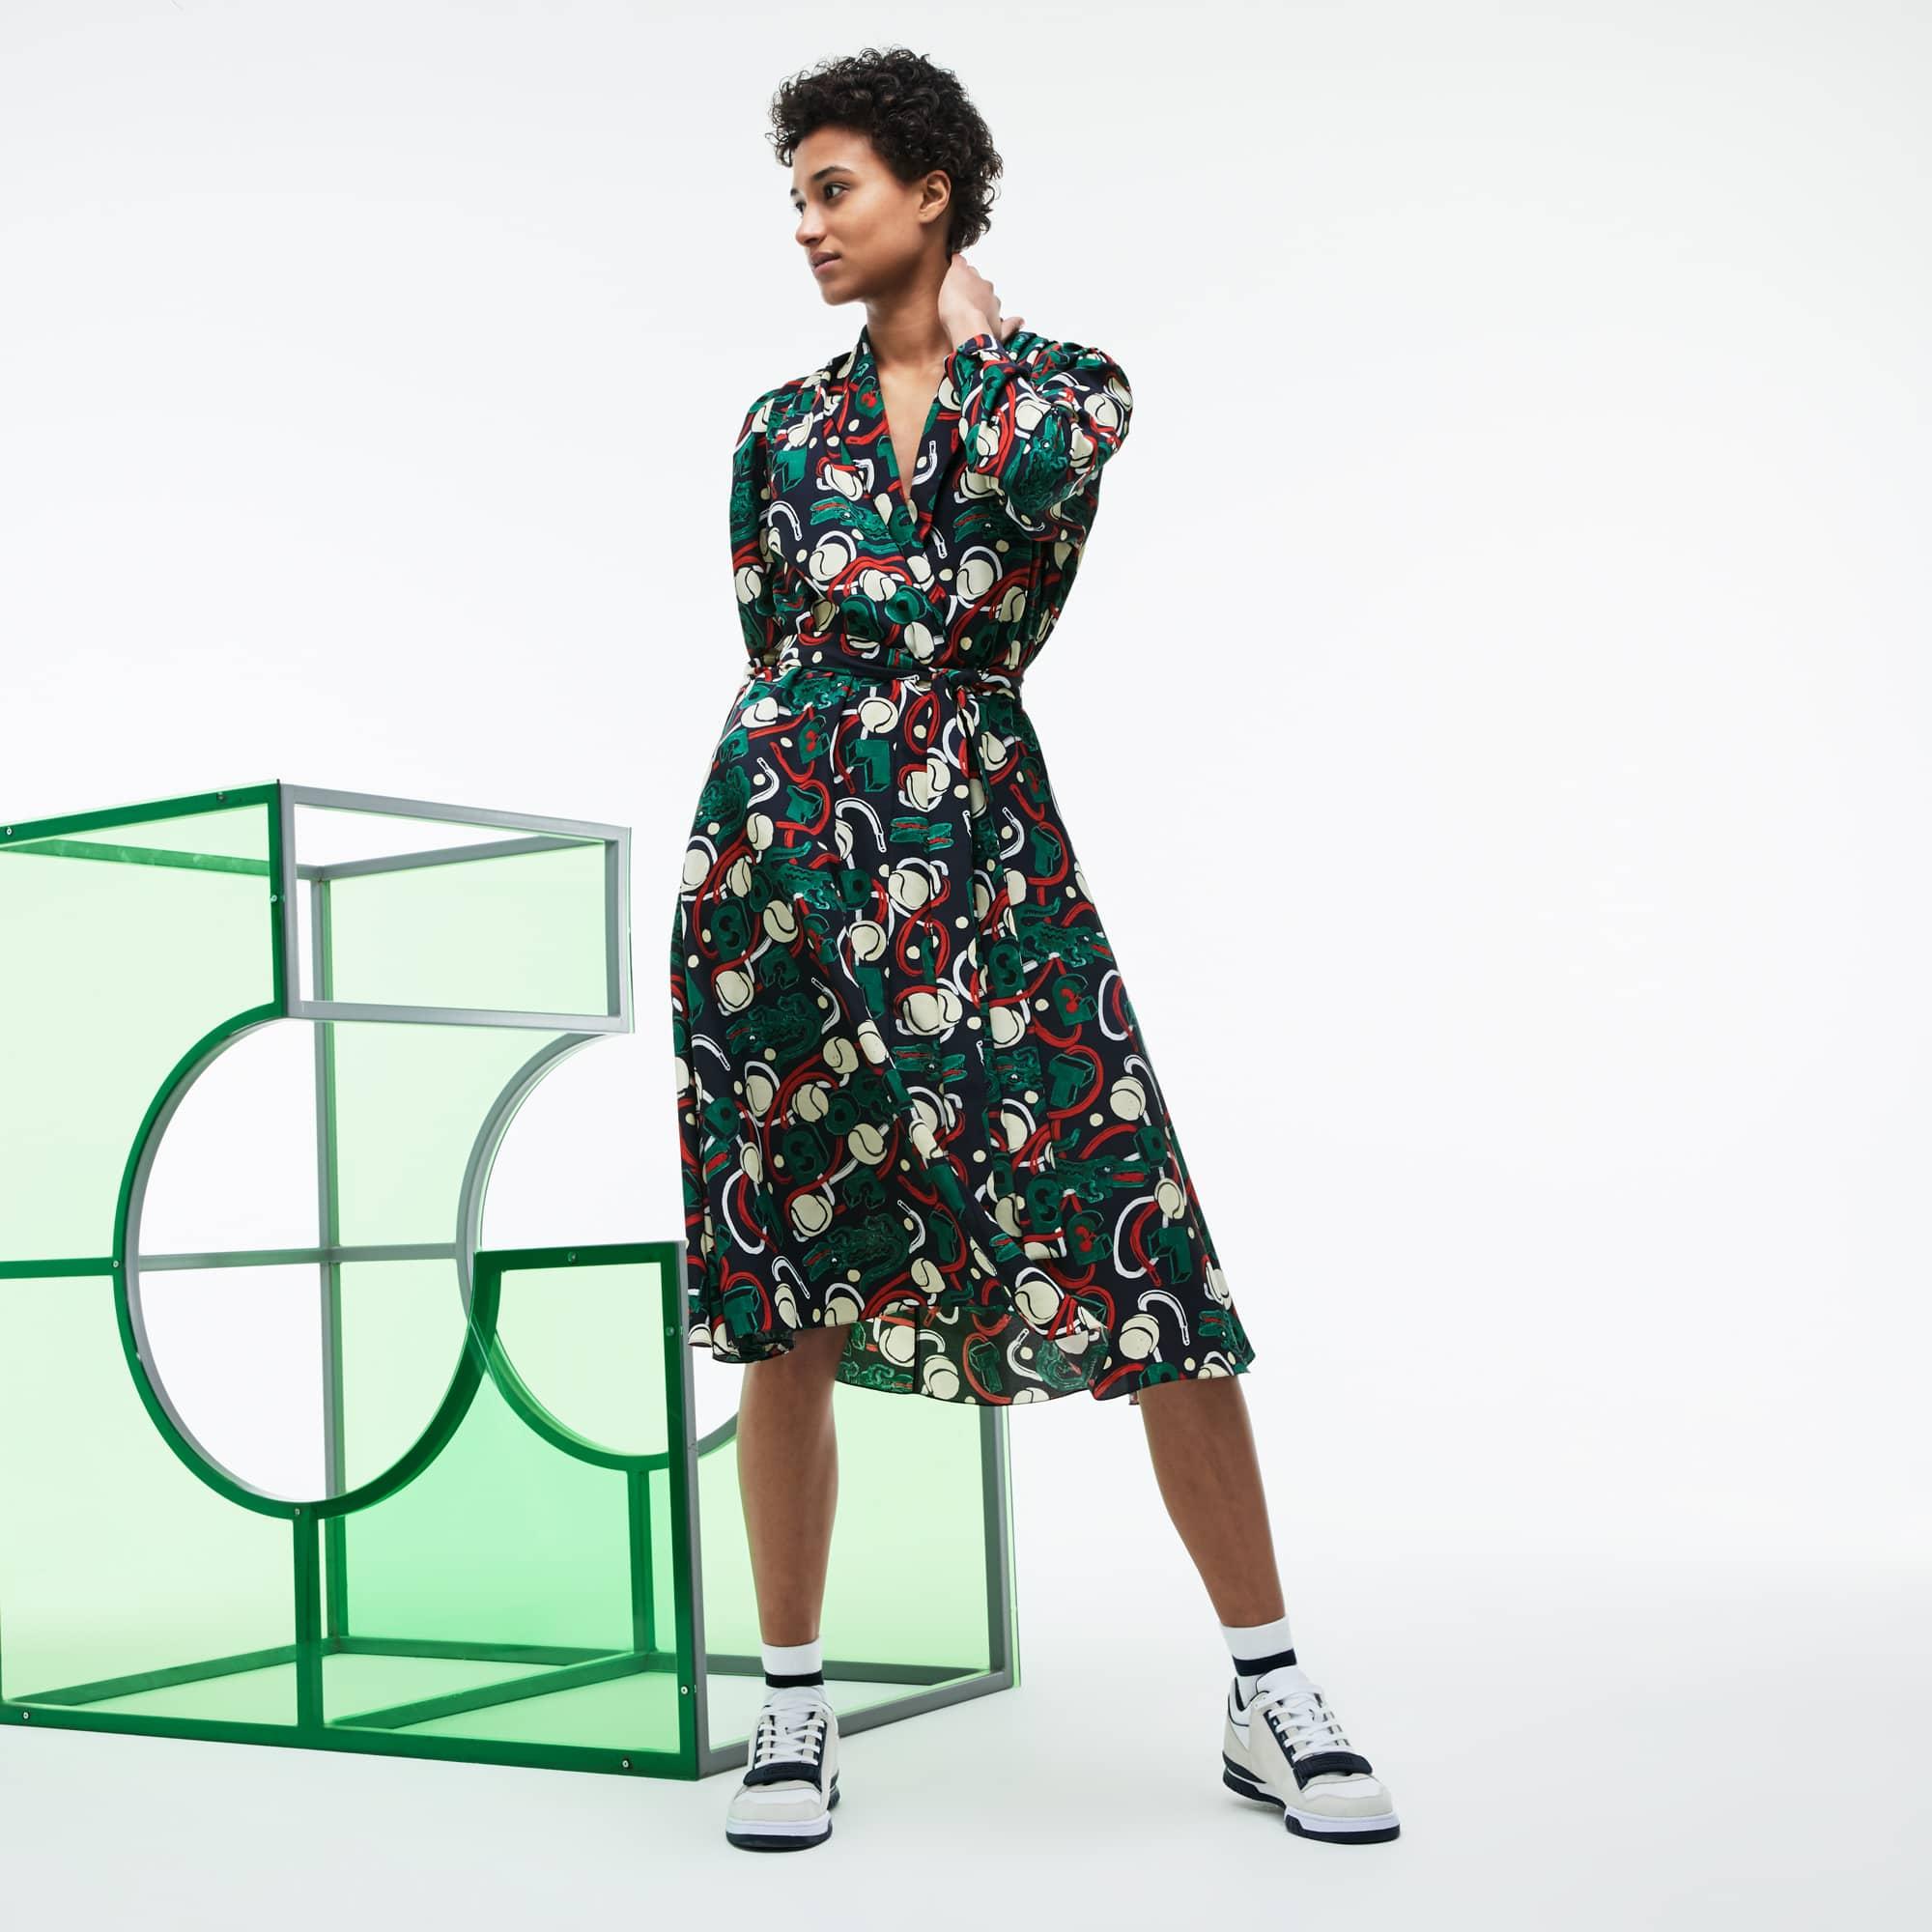 Women's Fashion Show MM Collab Print Wraparound Knit Dress